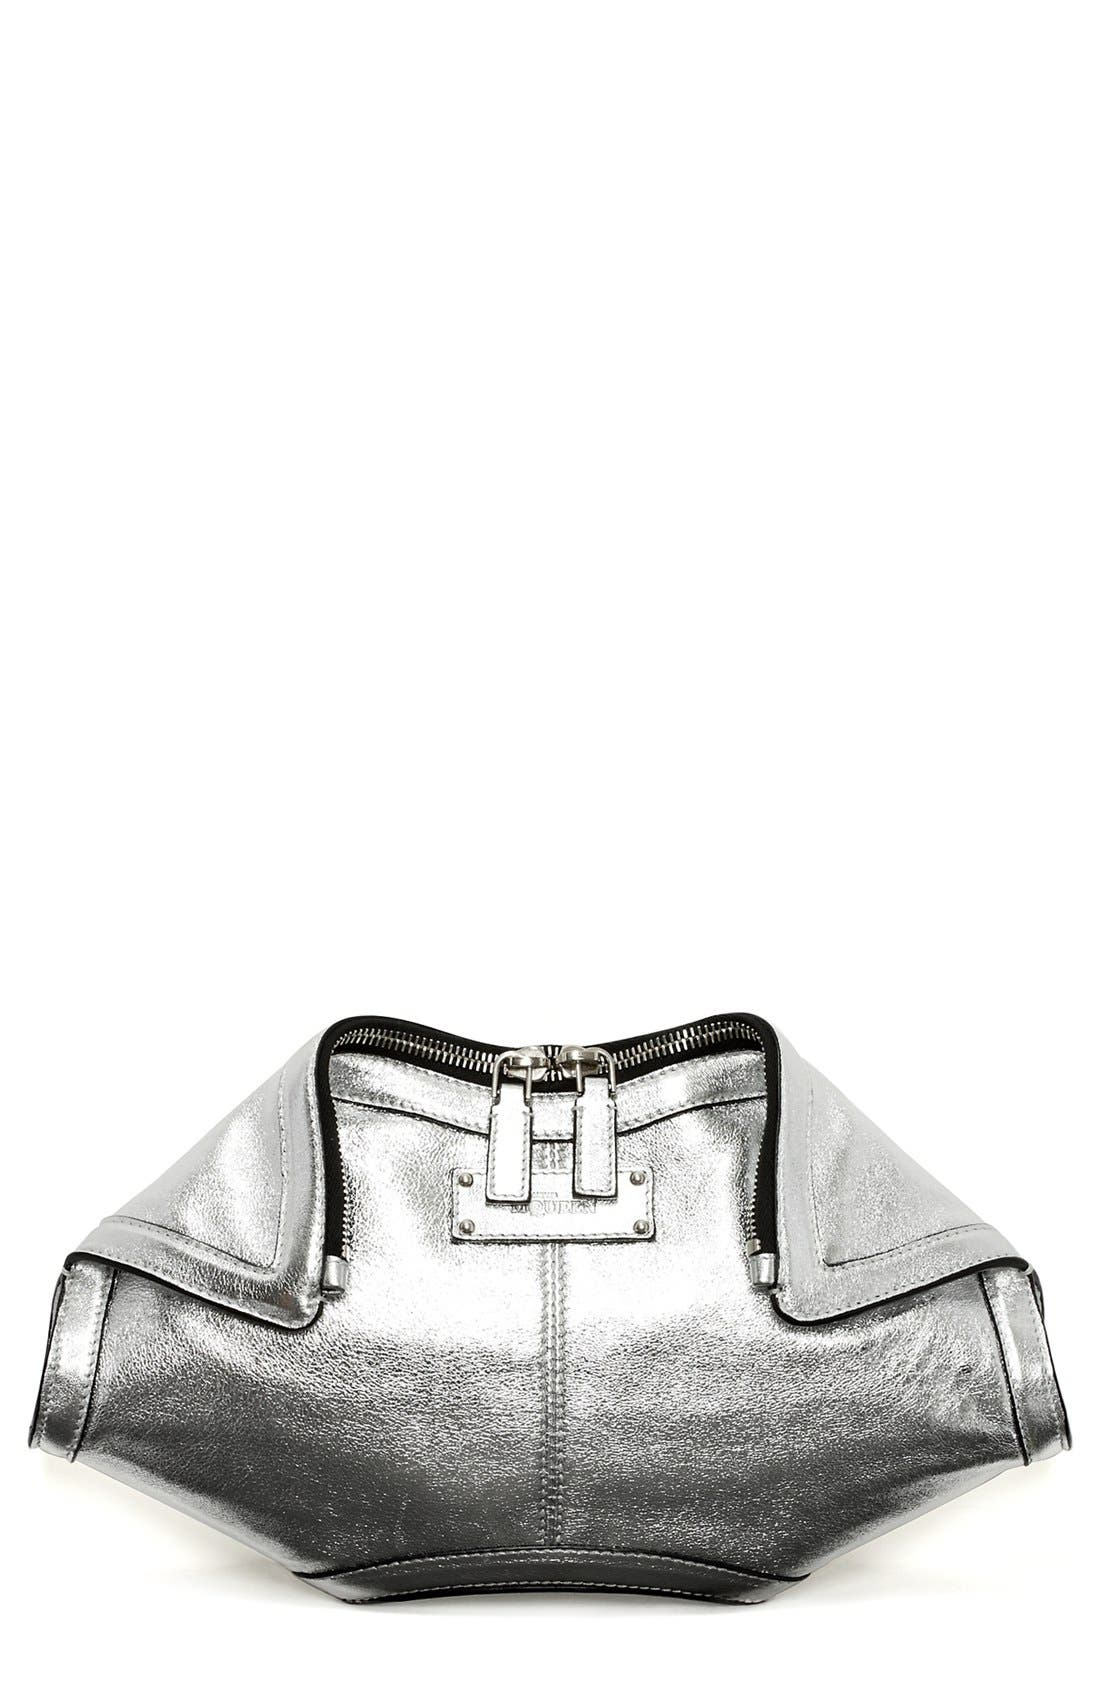 Main Image - Alexander McQueen 'De Manta - Small' Metallic Clutch